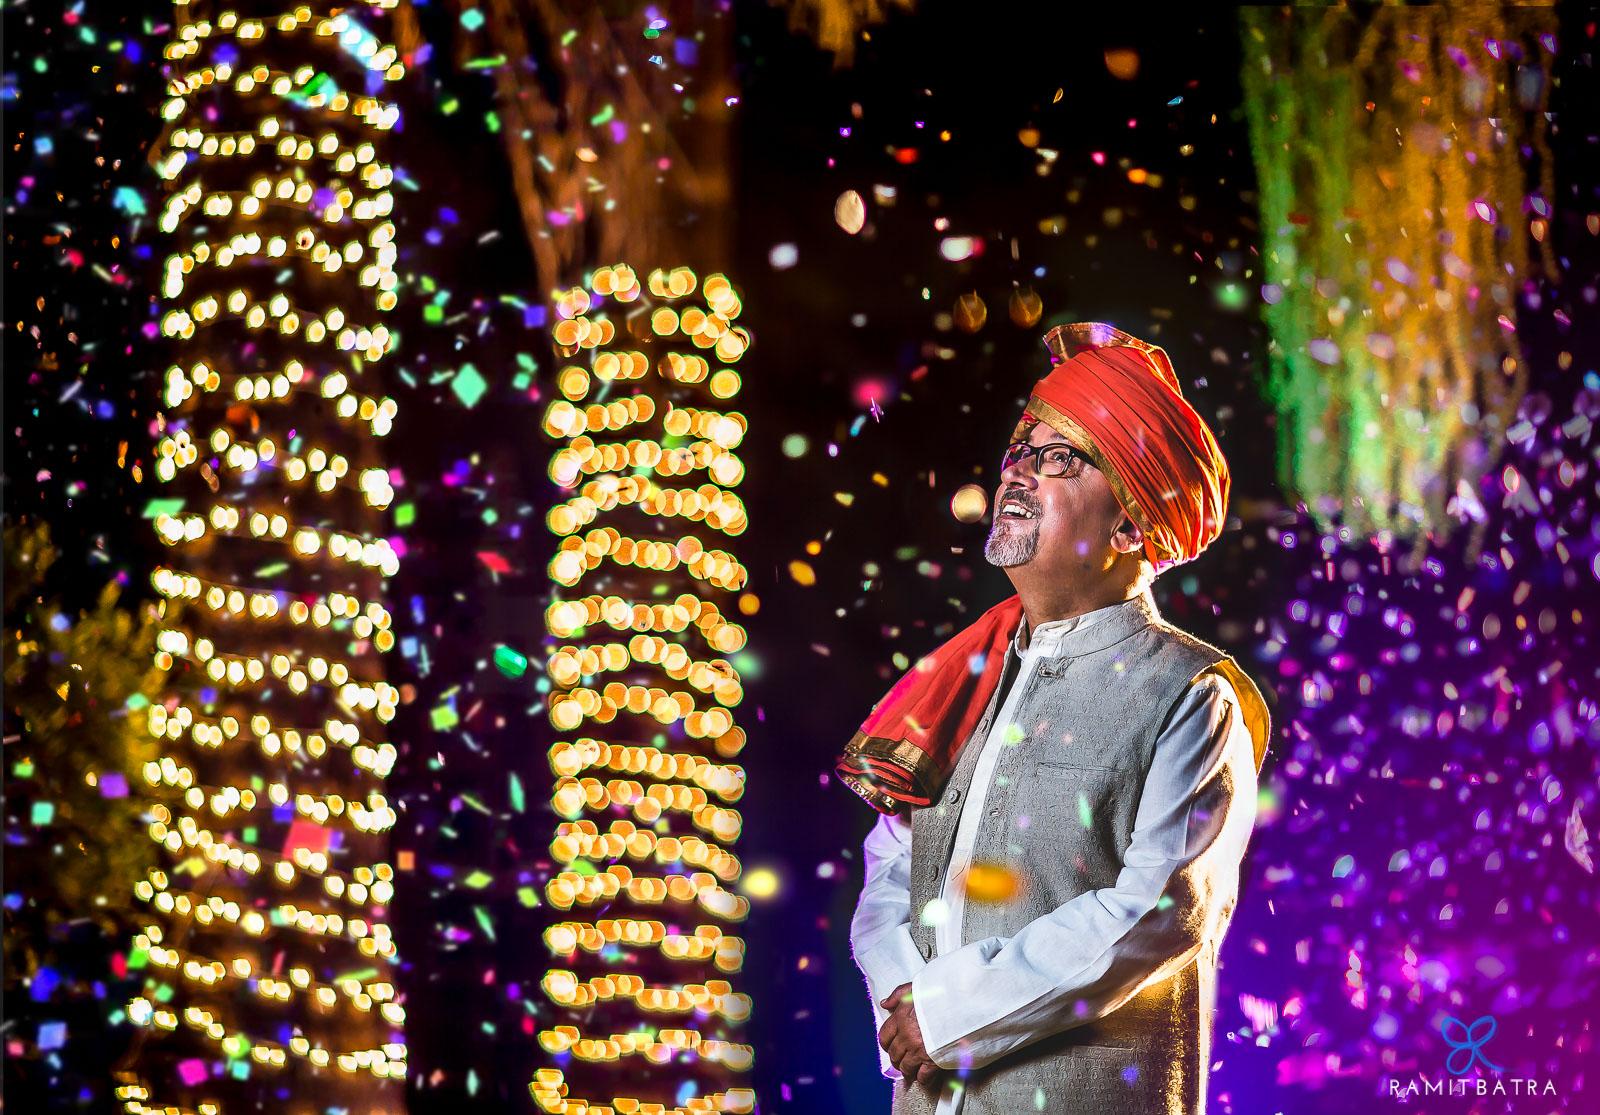 Fashion-Photographer-Fabindia-Ethnic-RamitBatra_99